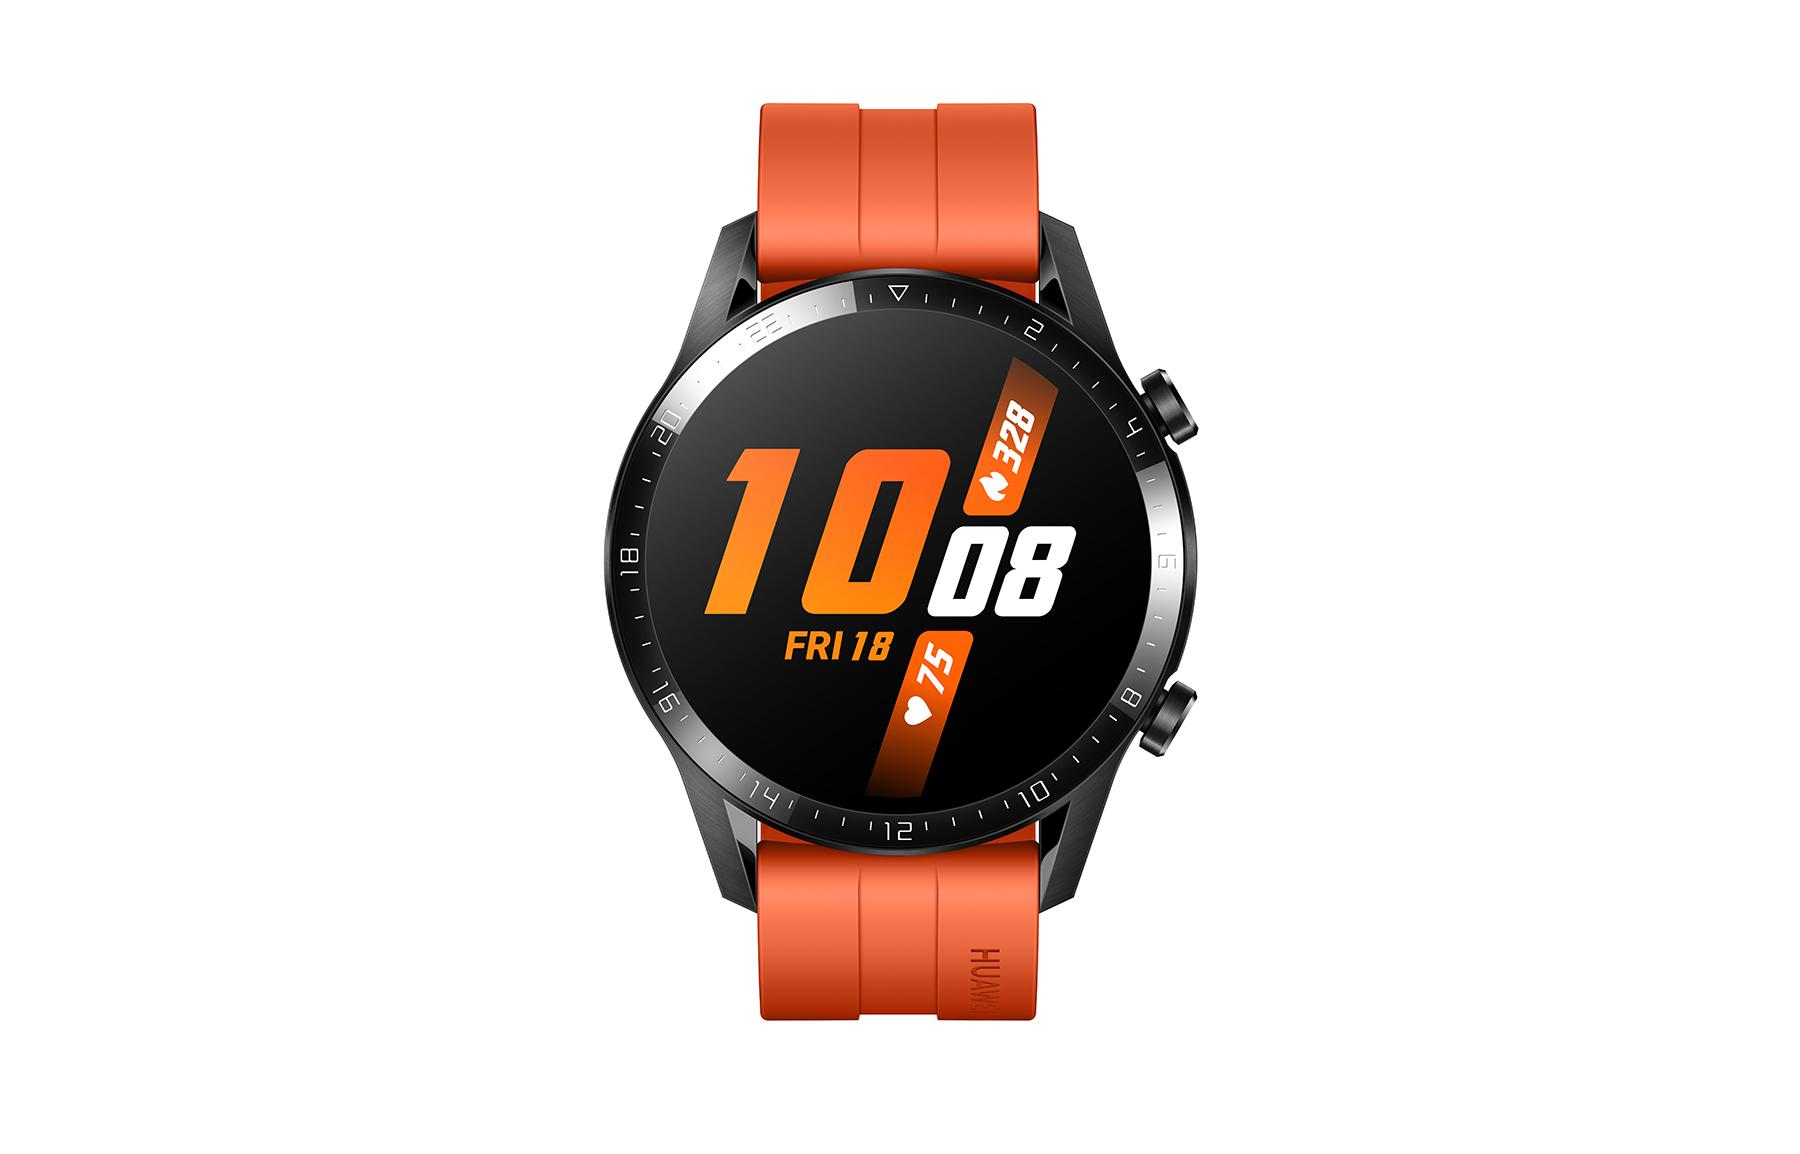 Huawei Watch GT 2 neurtu zuen ikuslearen pultsua!